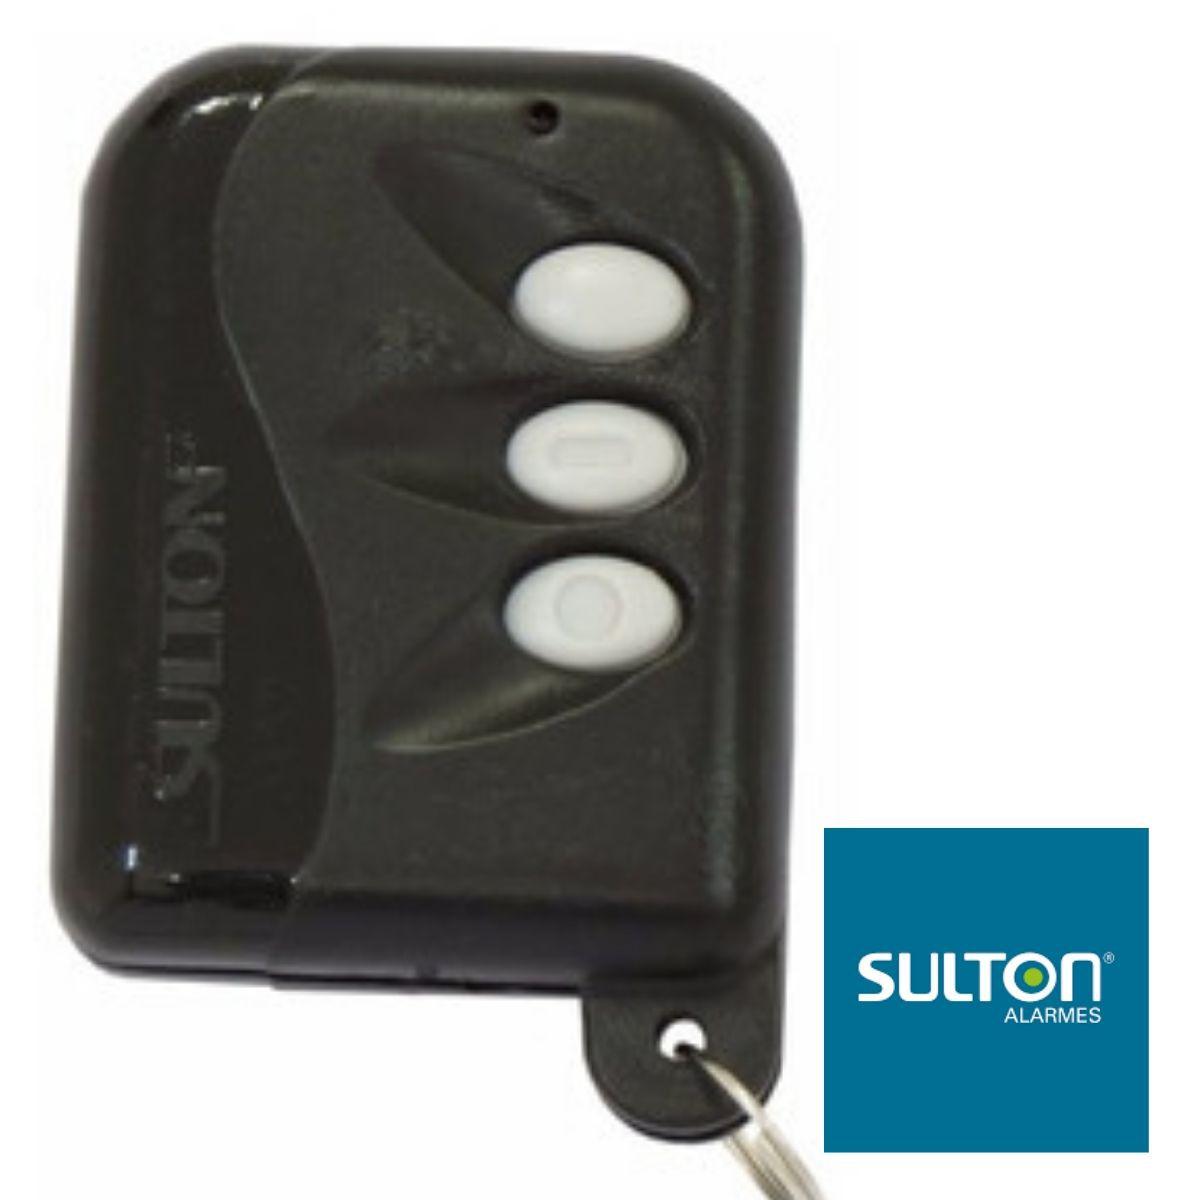 CONTROLE TCL SULTON  5 unidades